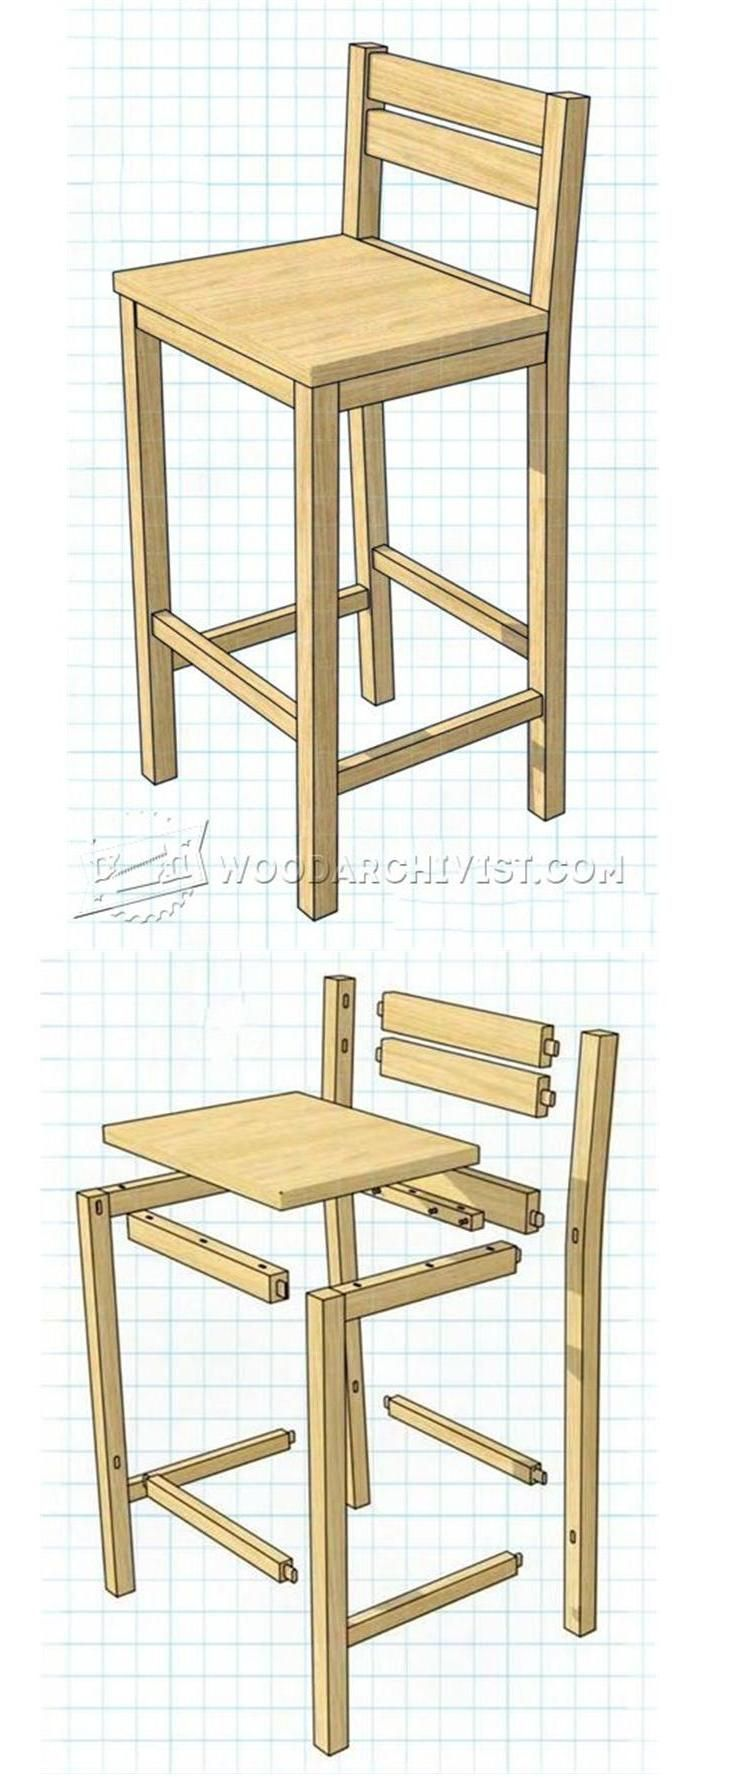 Diy Bar Stools Furniture Plans And Projects Woodarchivist Com